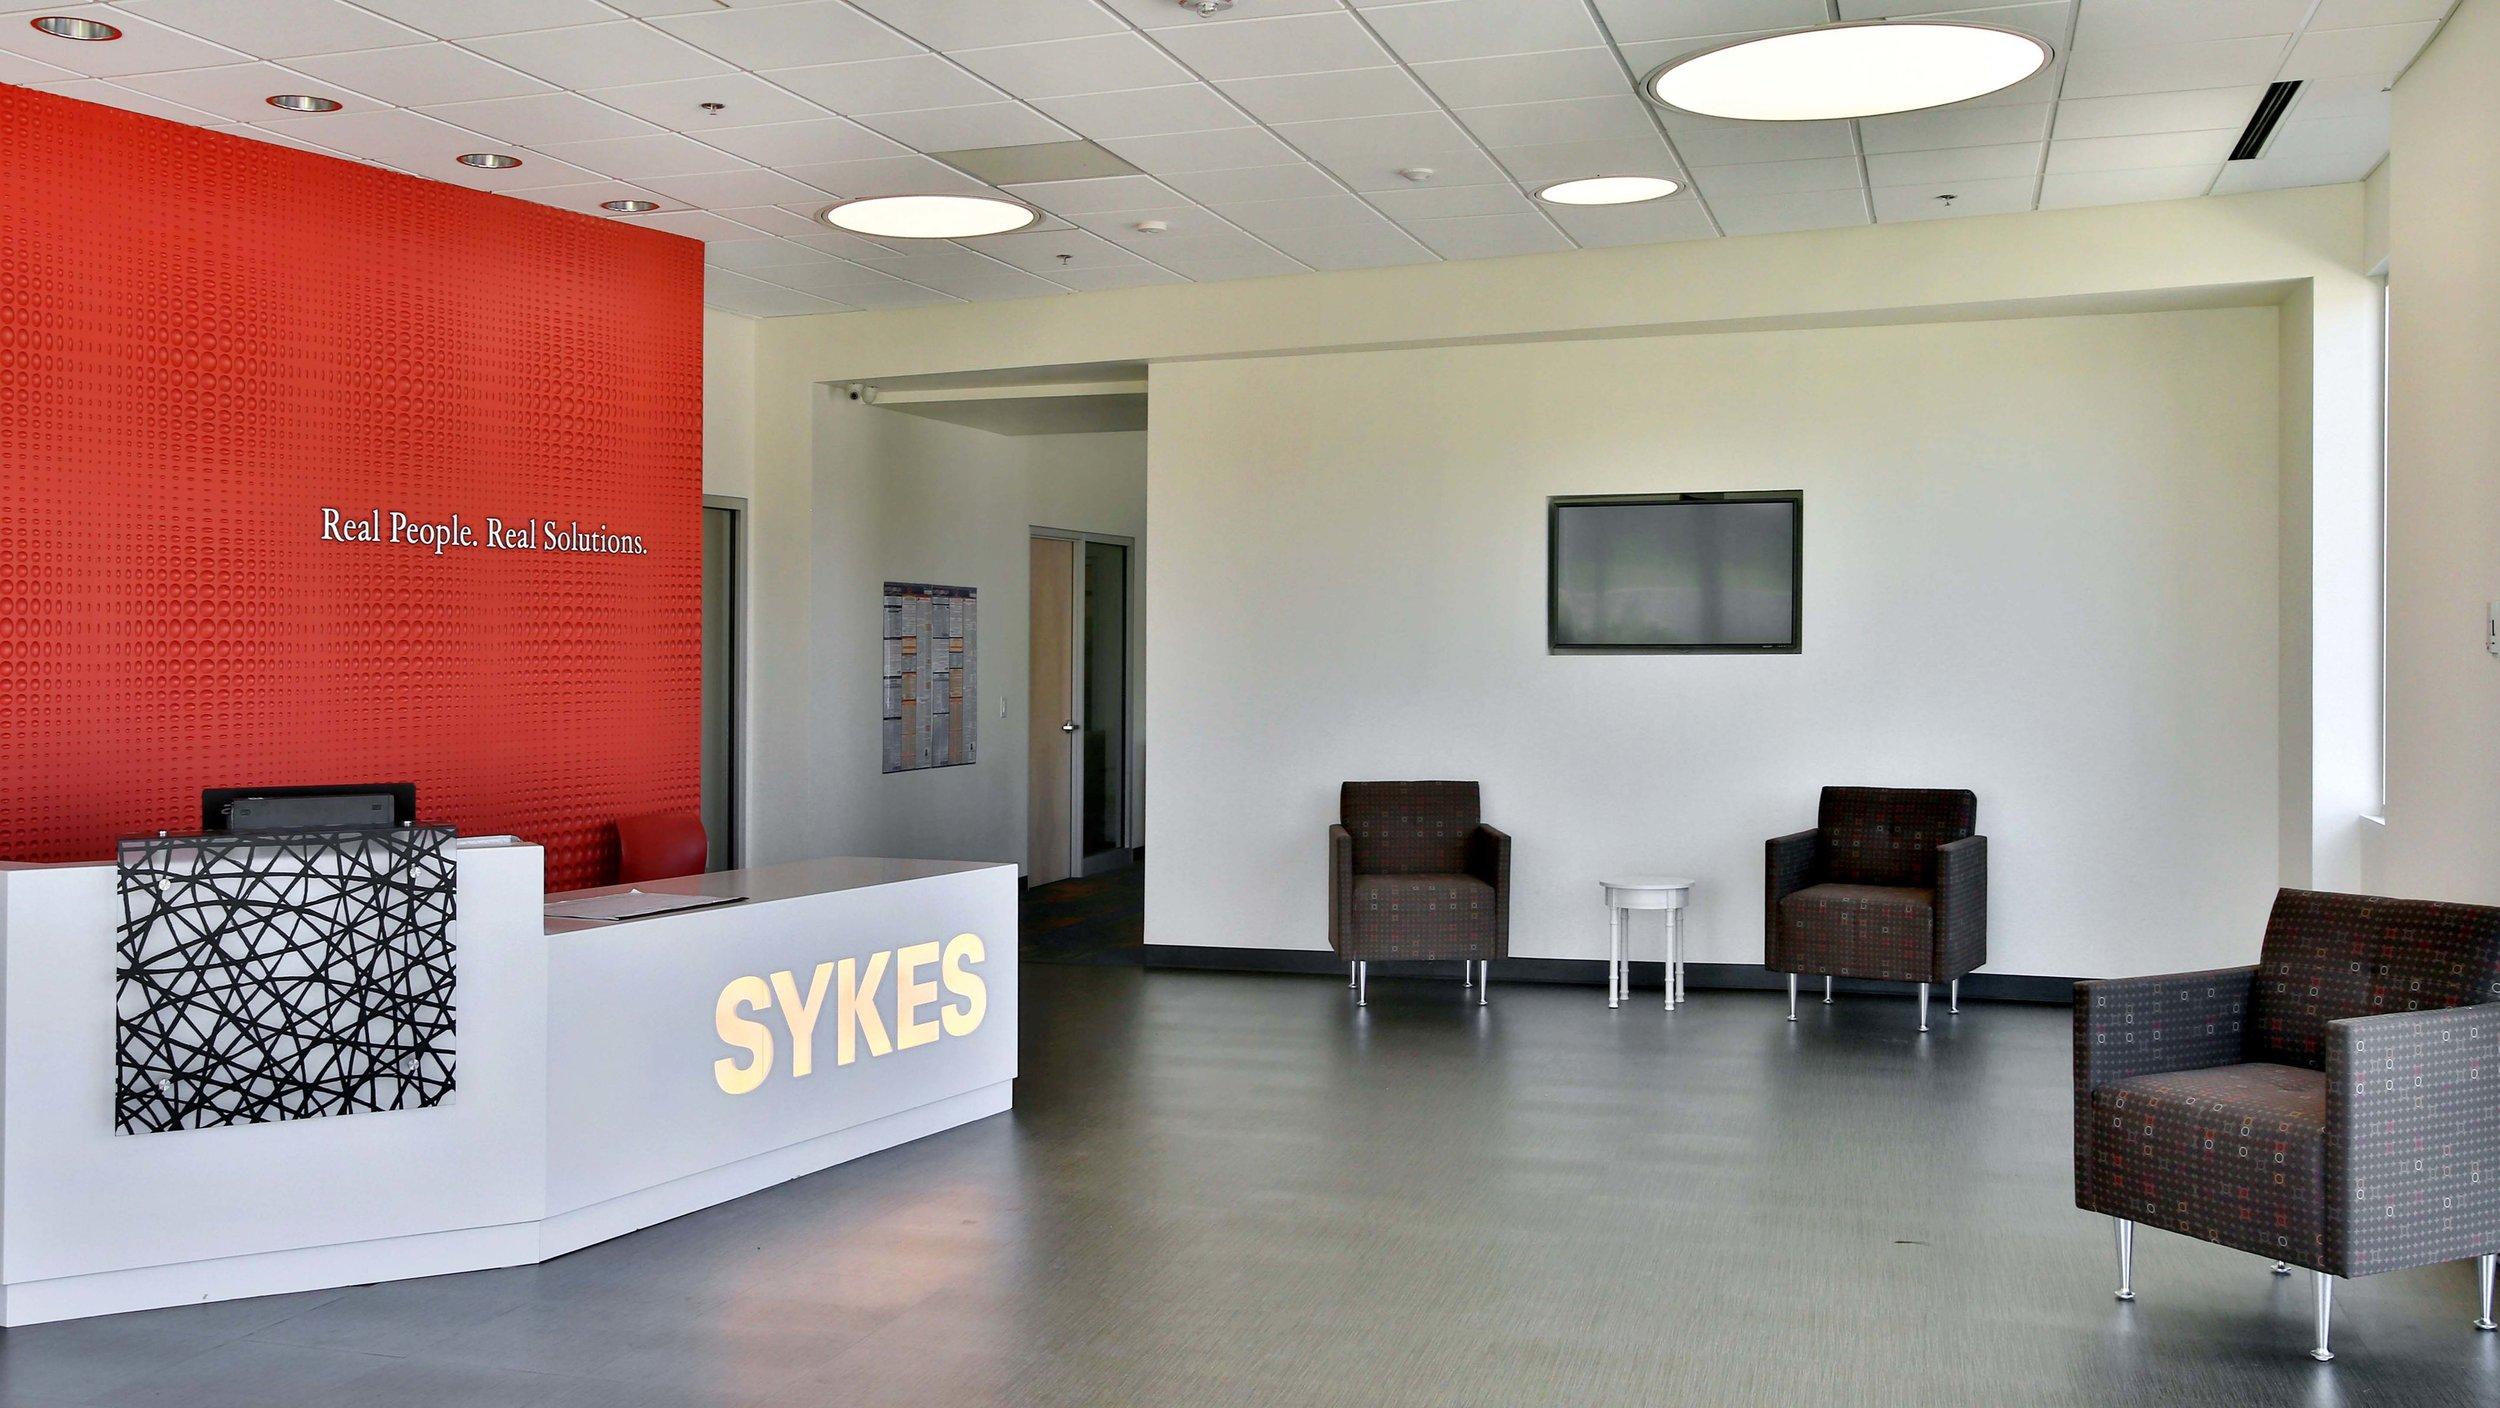 14-0417-112-Sykes.jpg